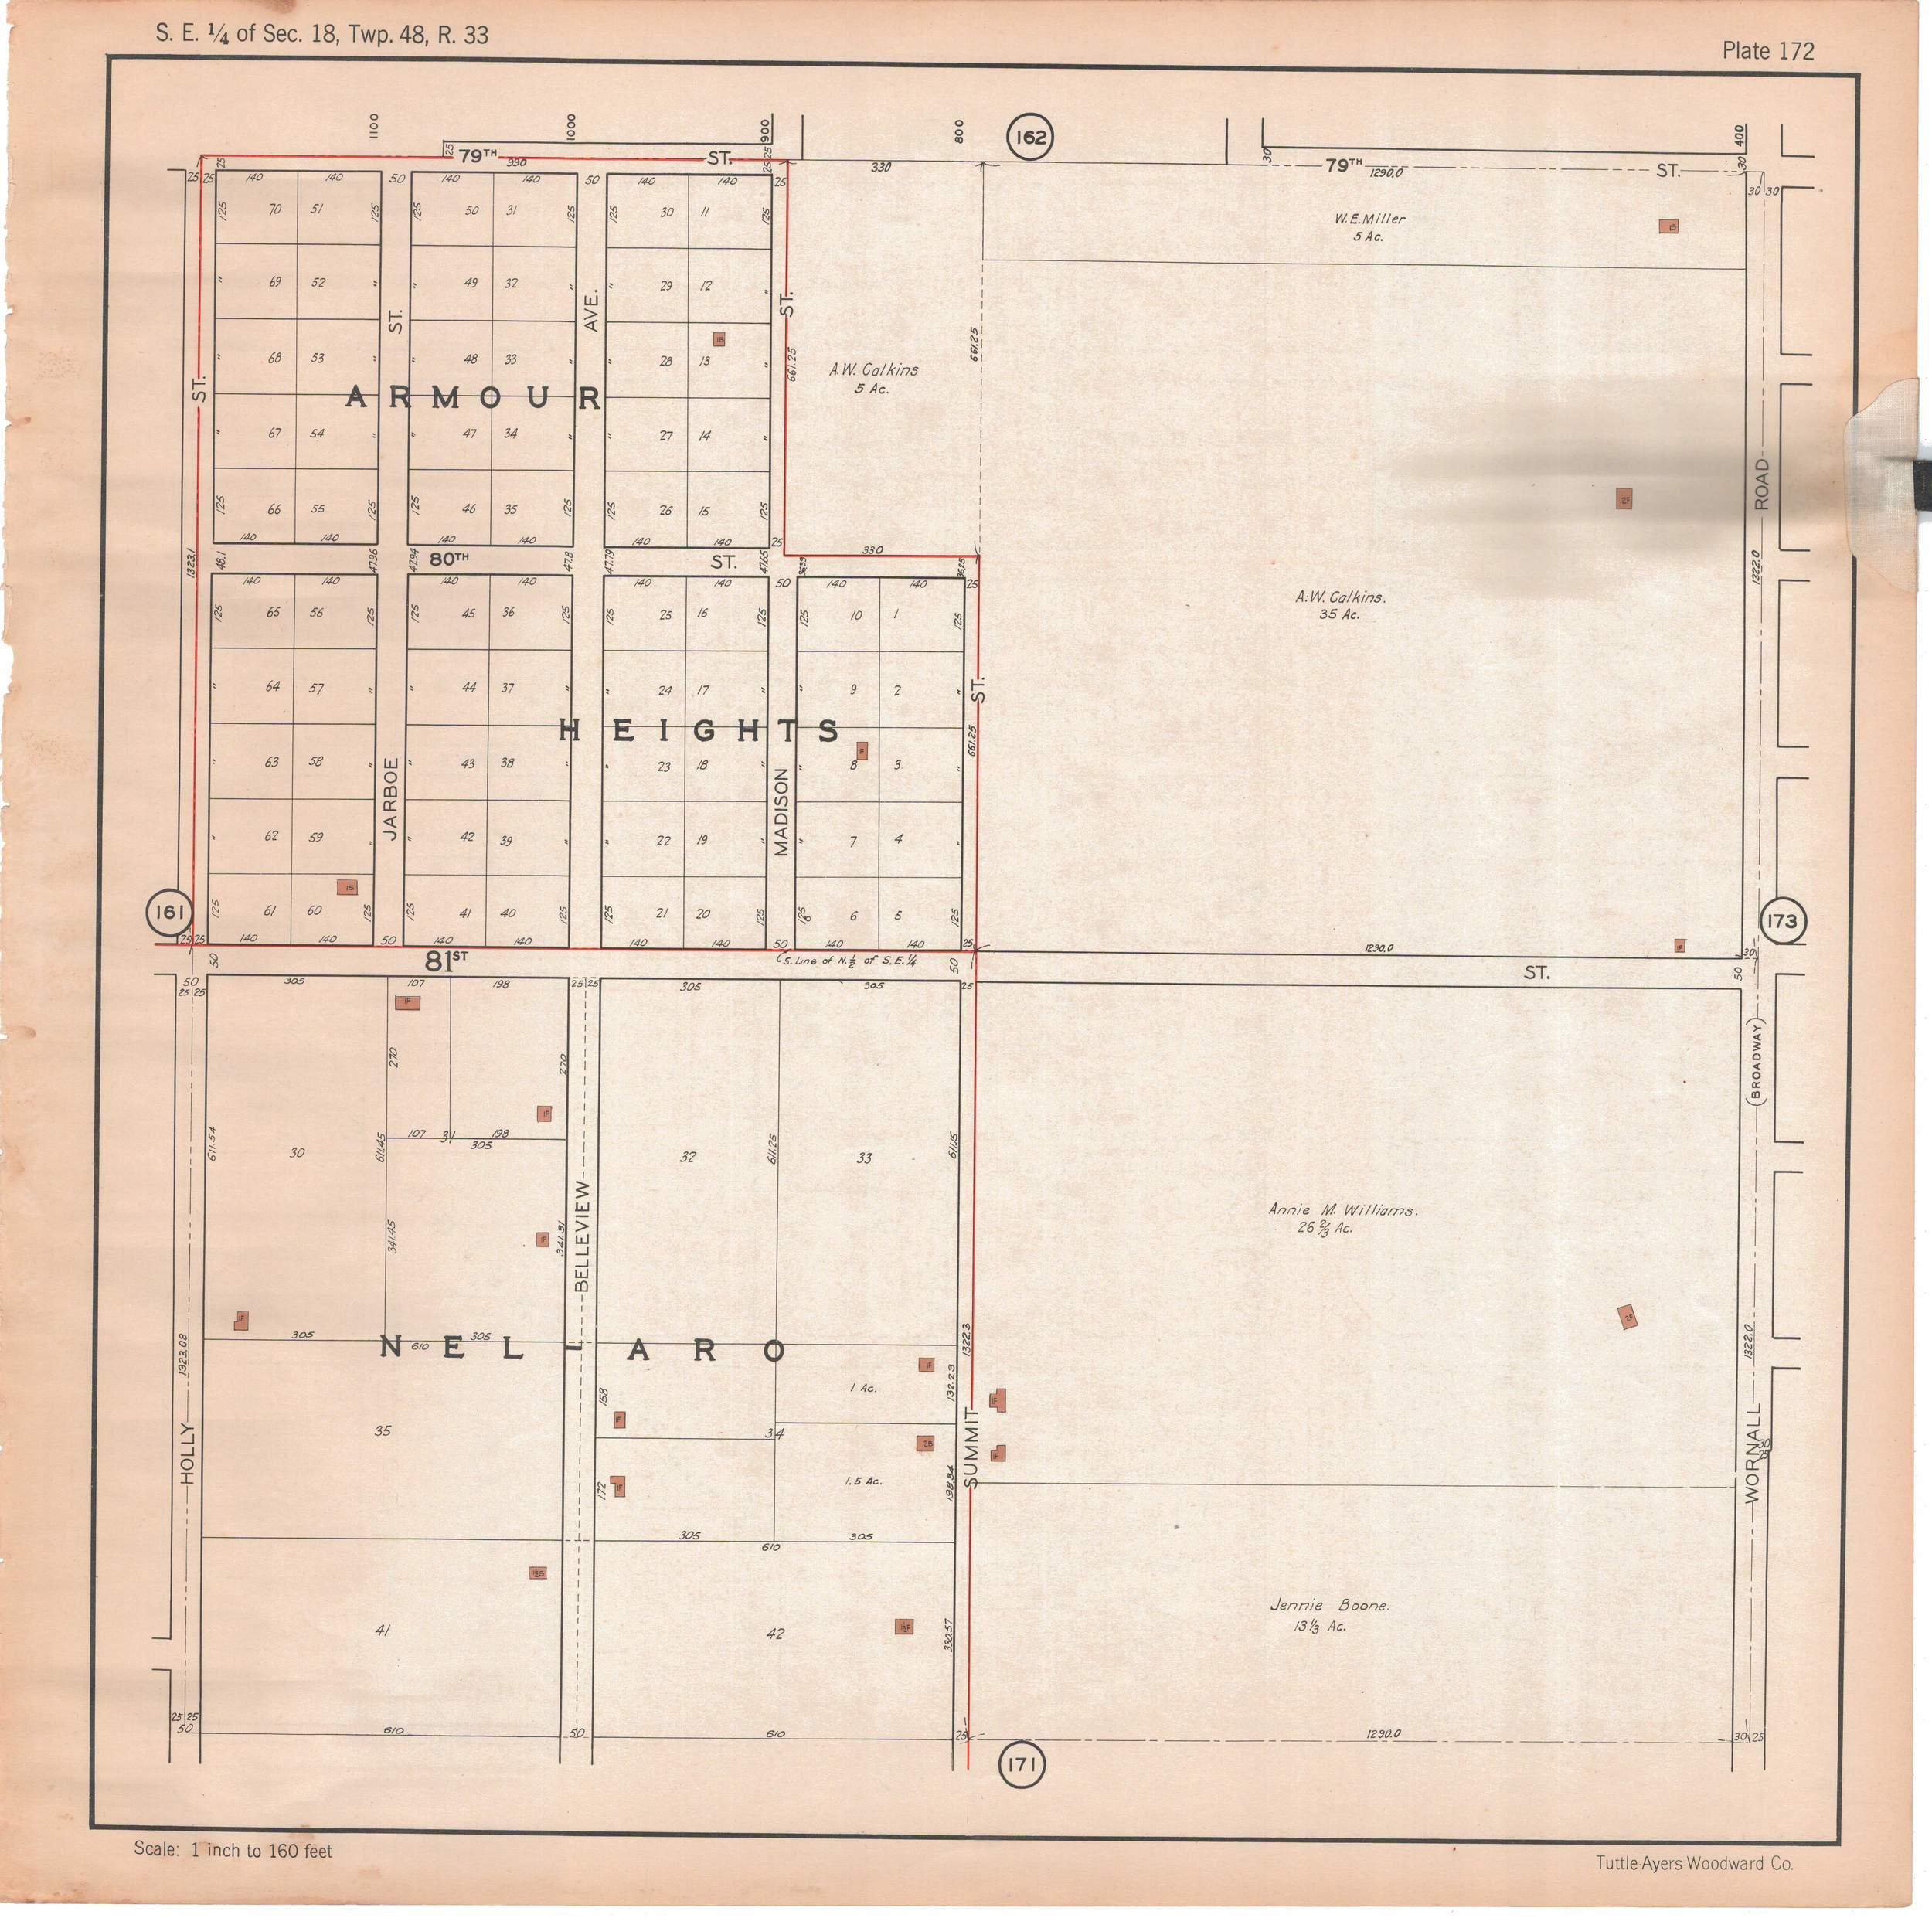 1925 TUTTLE_AYERS_Plate_172.JPG